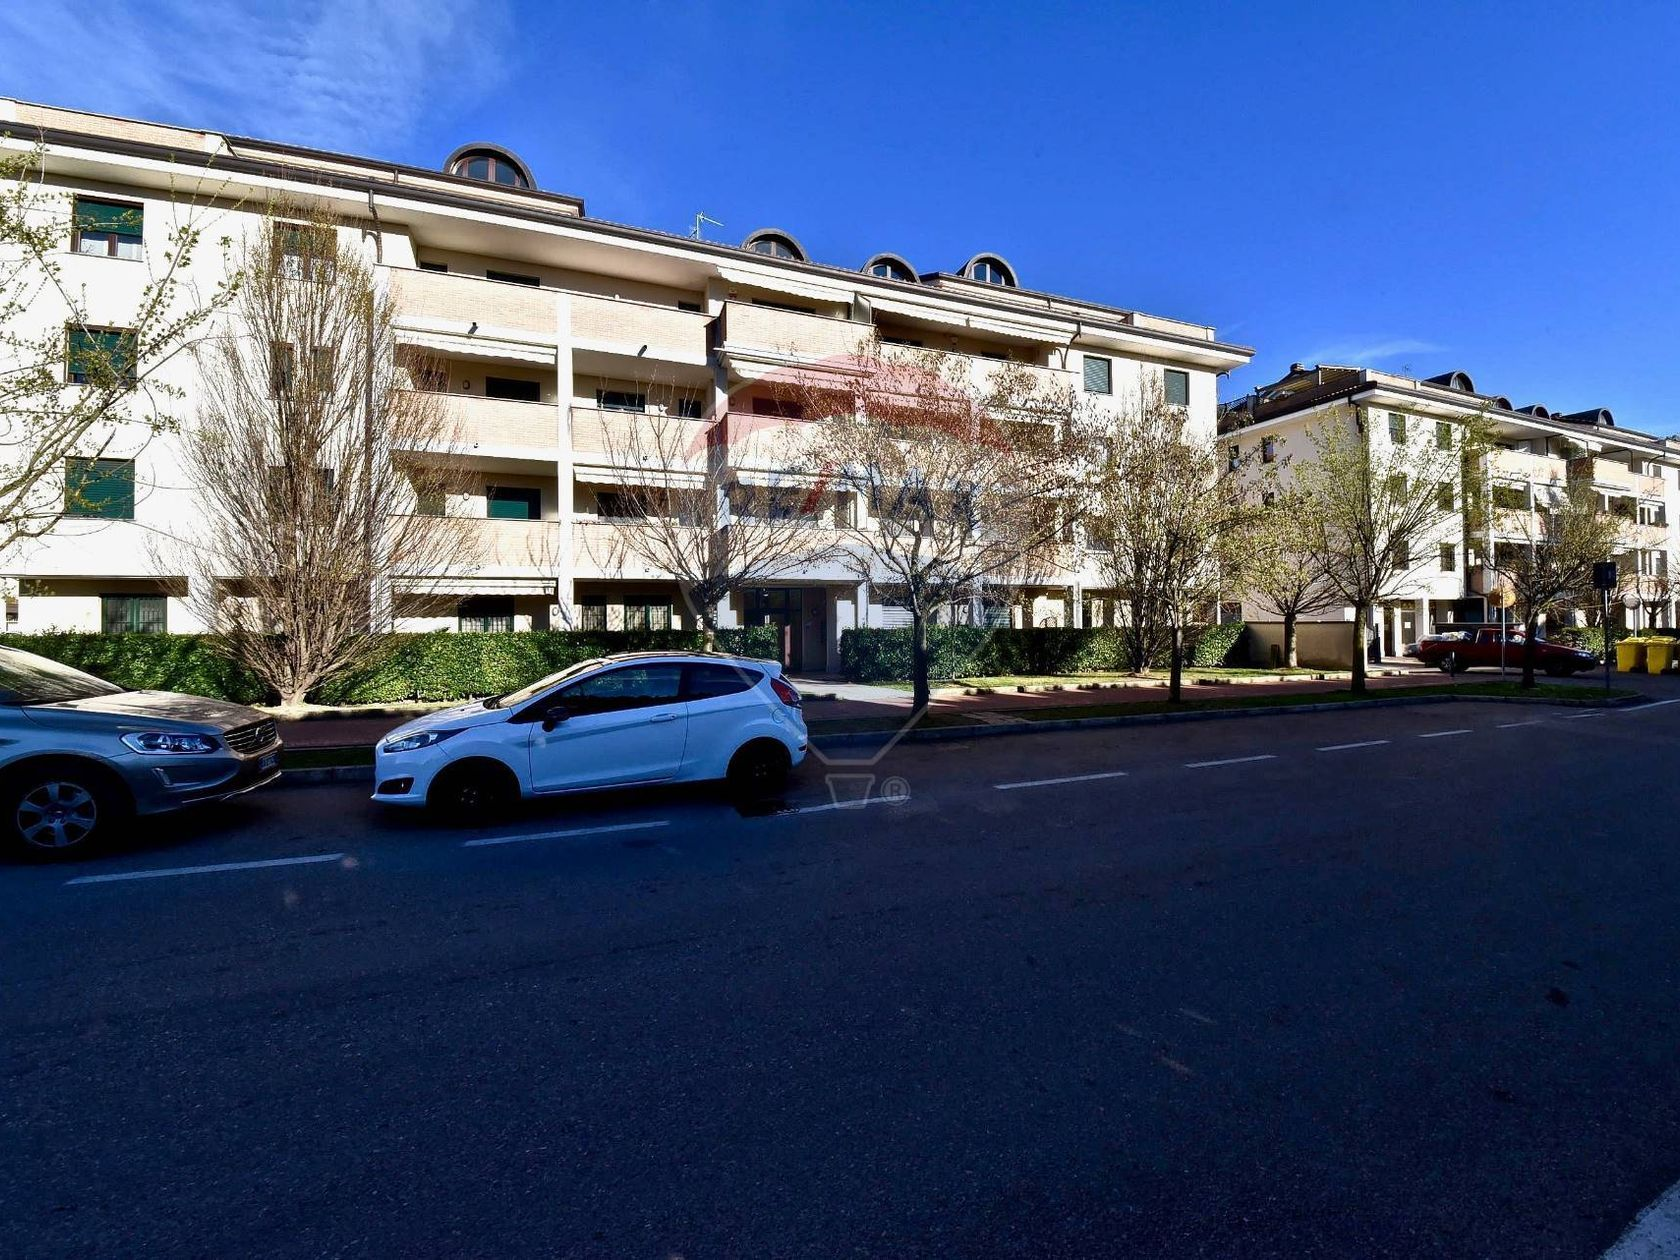 Appartamento Cascina ferrara, Saronno, VA Vendita - Foto 20